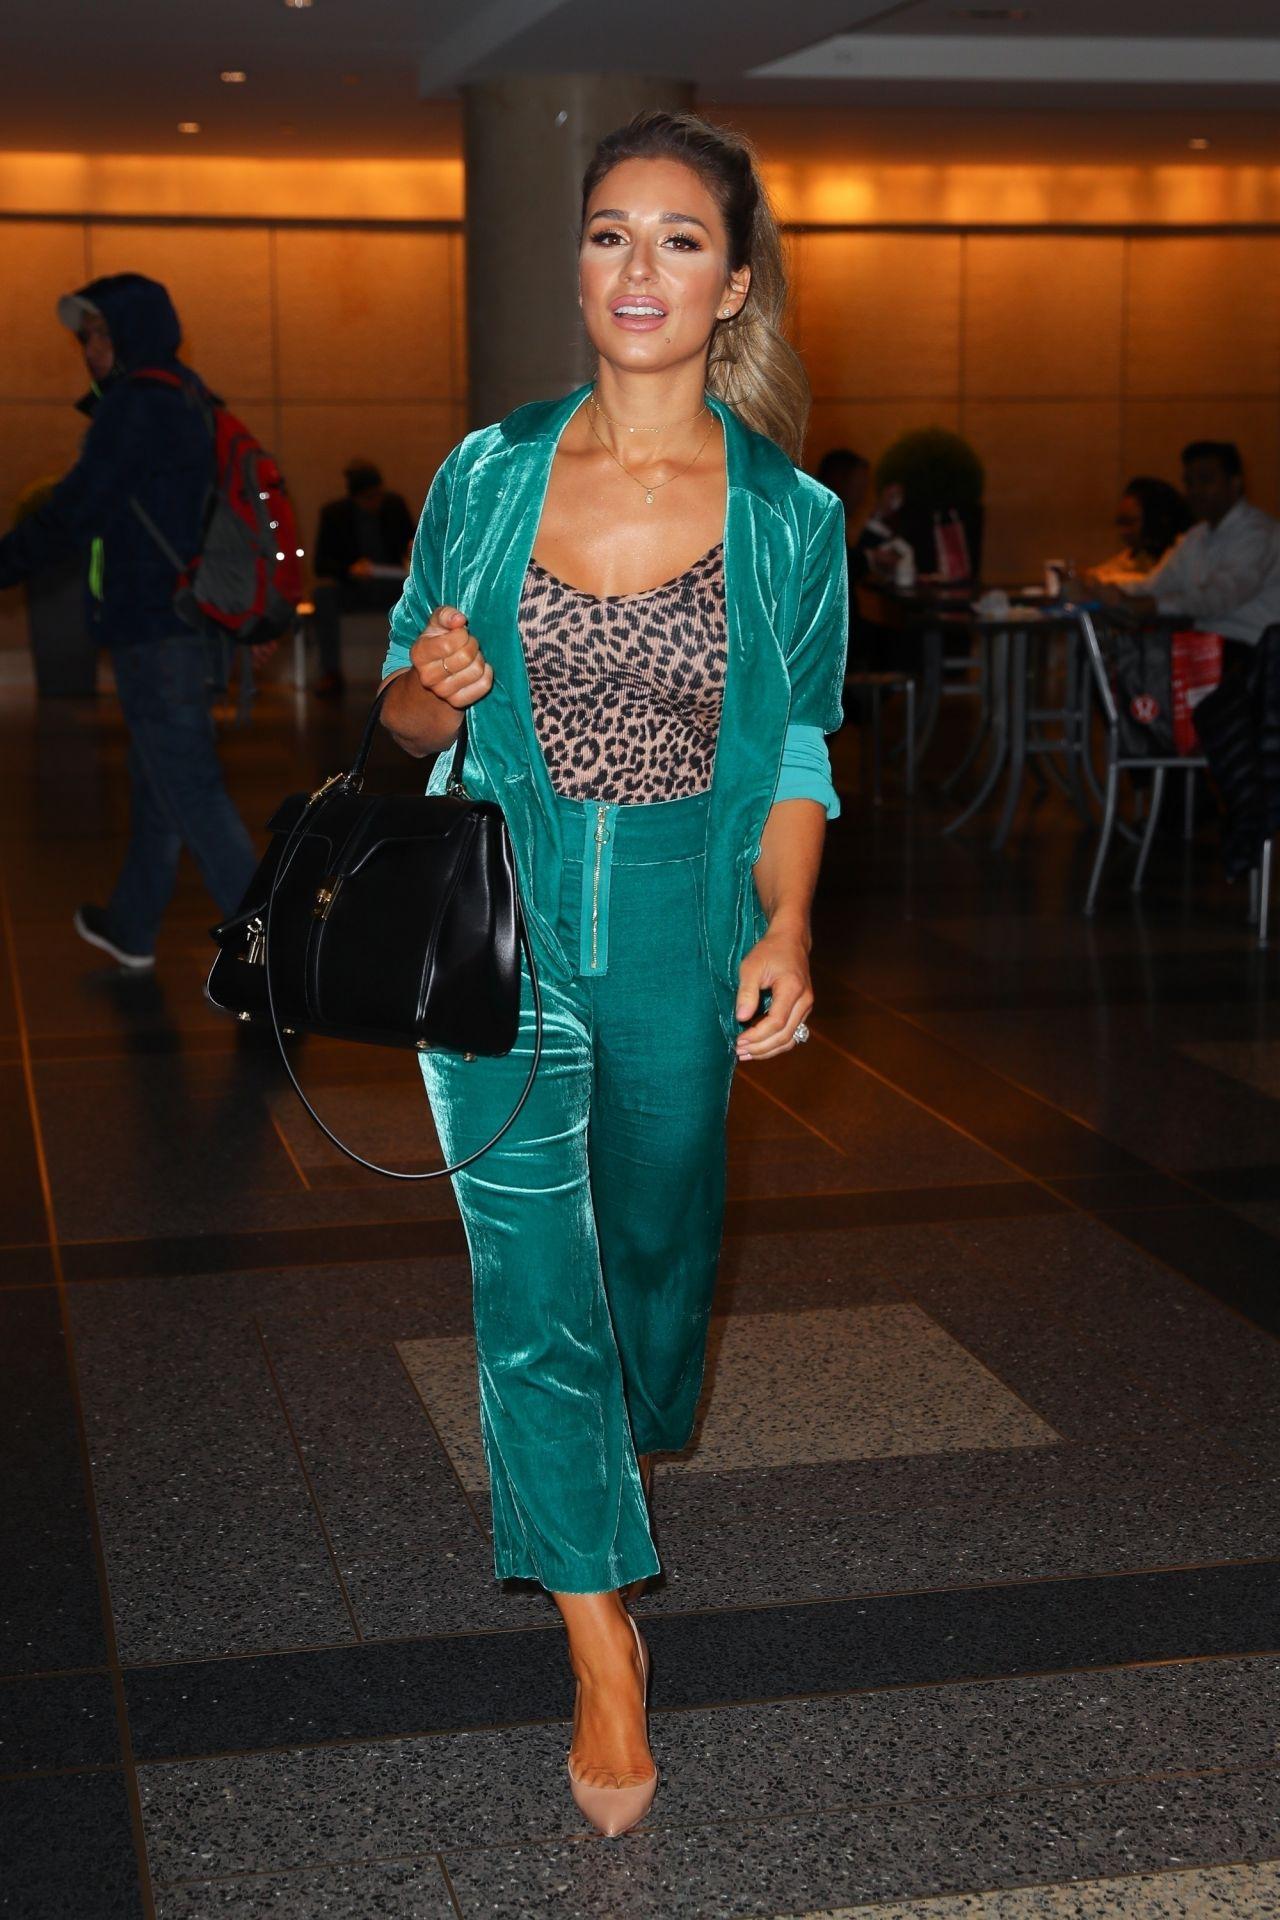 Jessie James Decker Night Out Style 01/09/2019